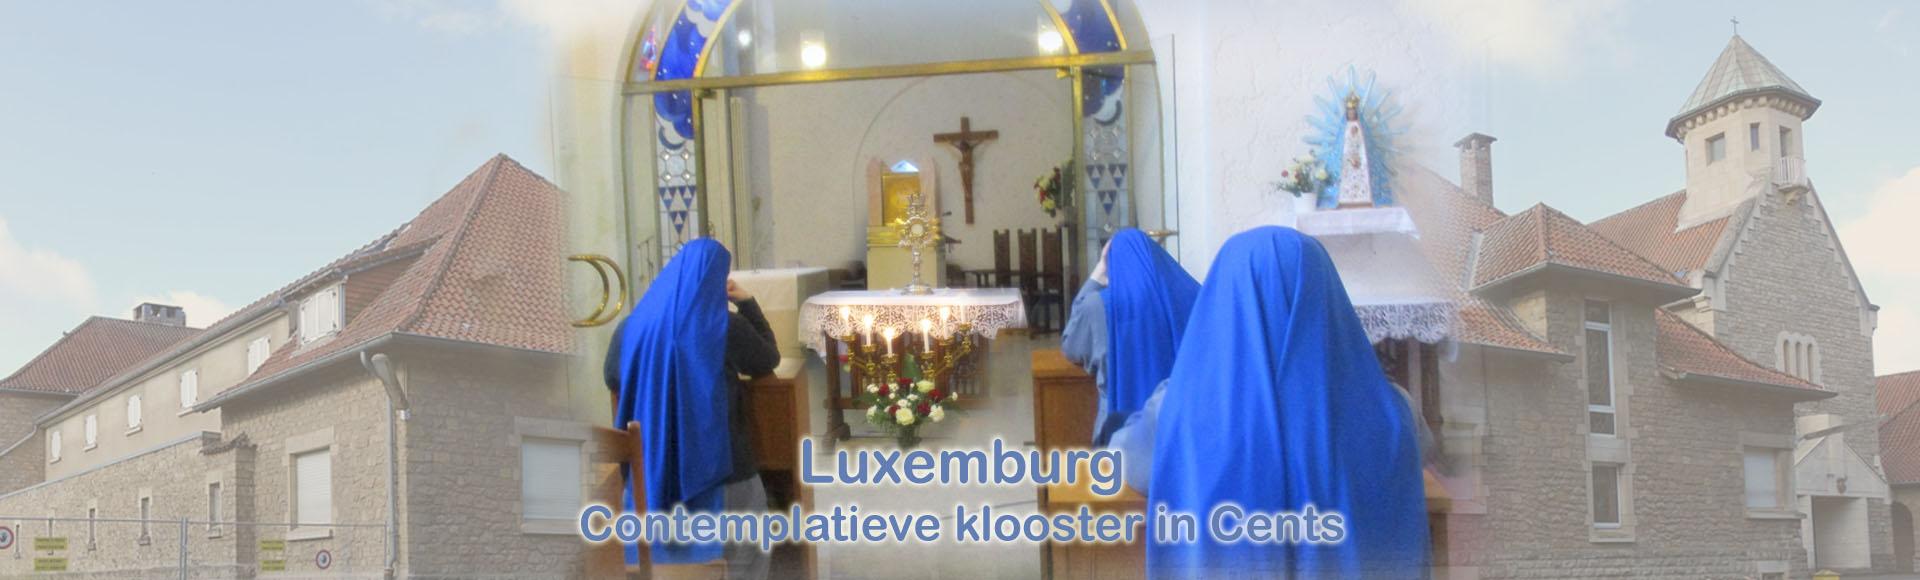 SSVM-Blauwe-Zusters-Contemplatieve-klooster-in-Luxemburg-Cents